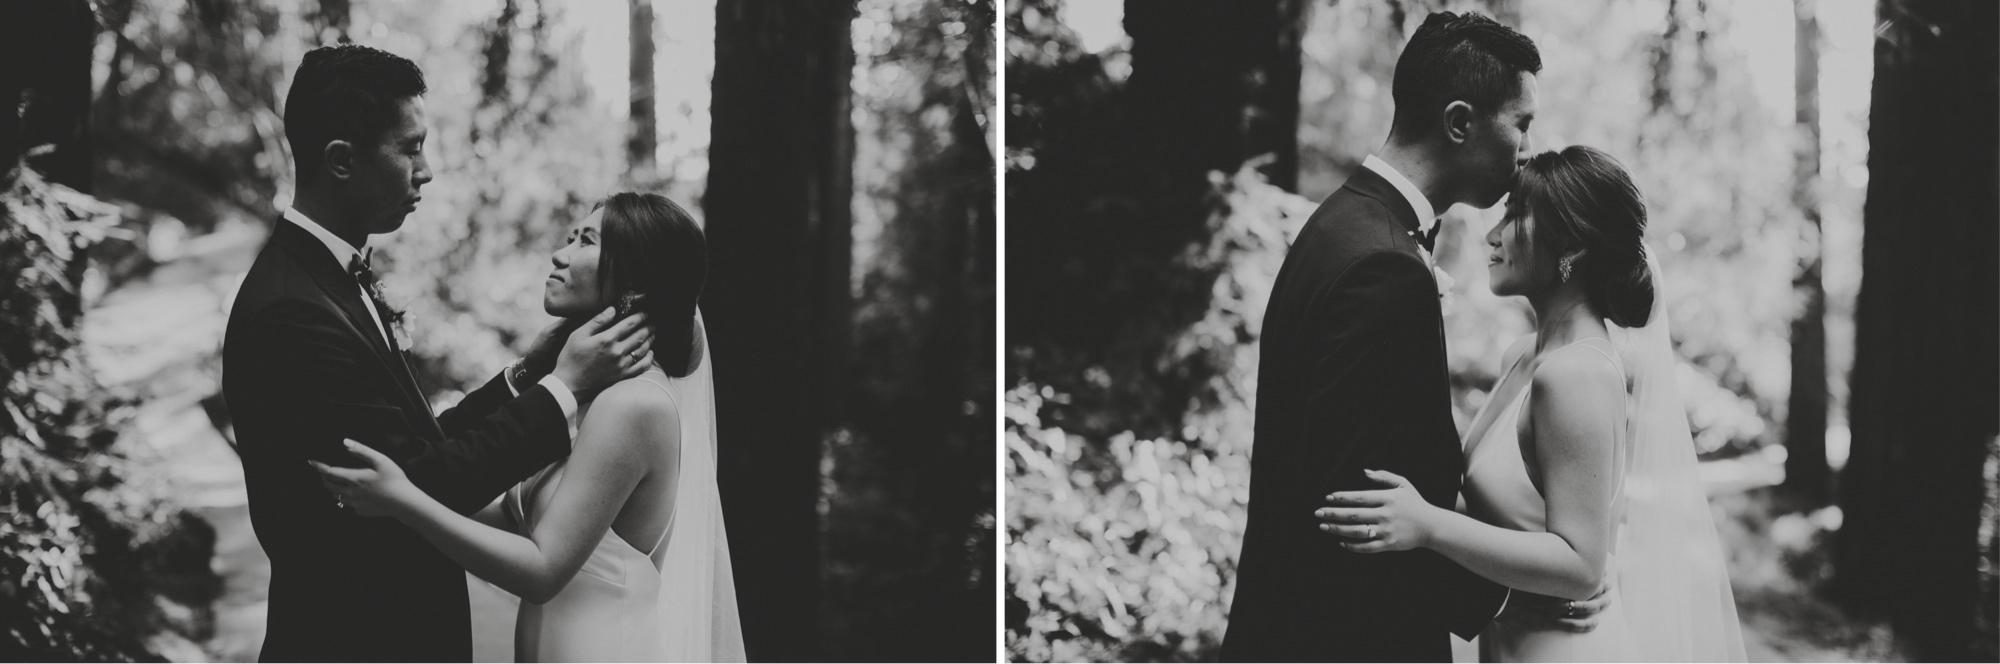 Romantic couple kissing black and white